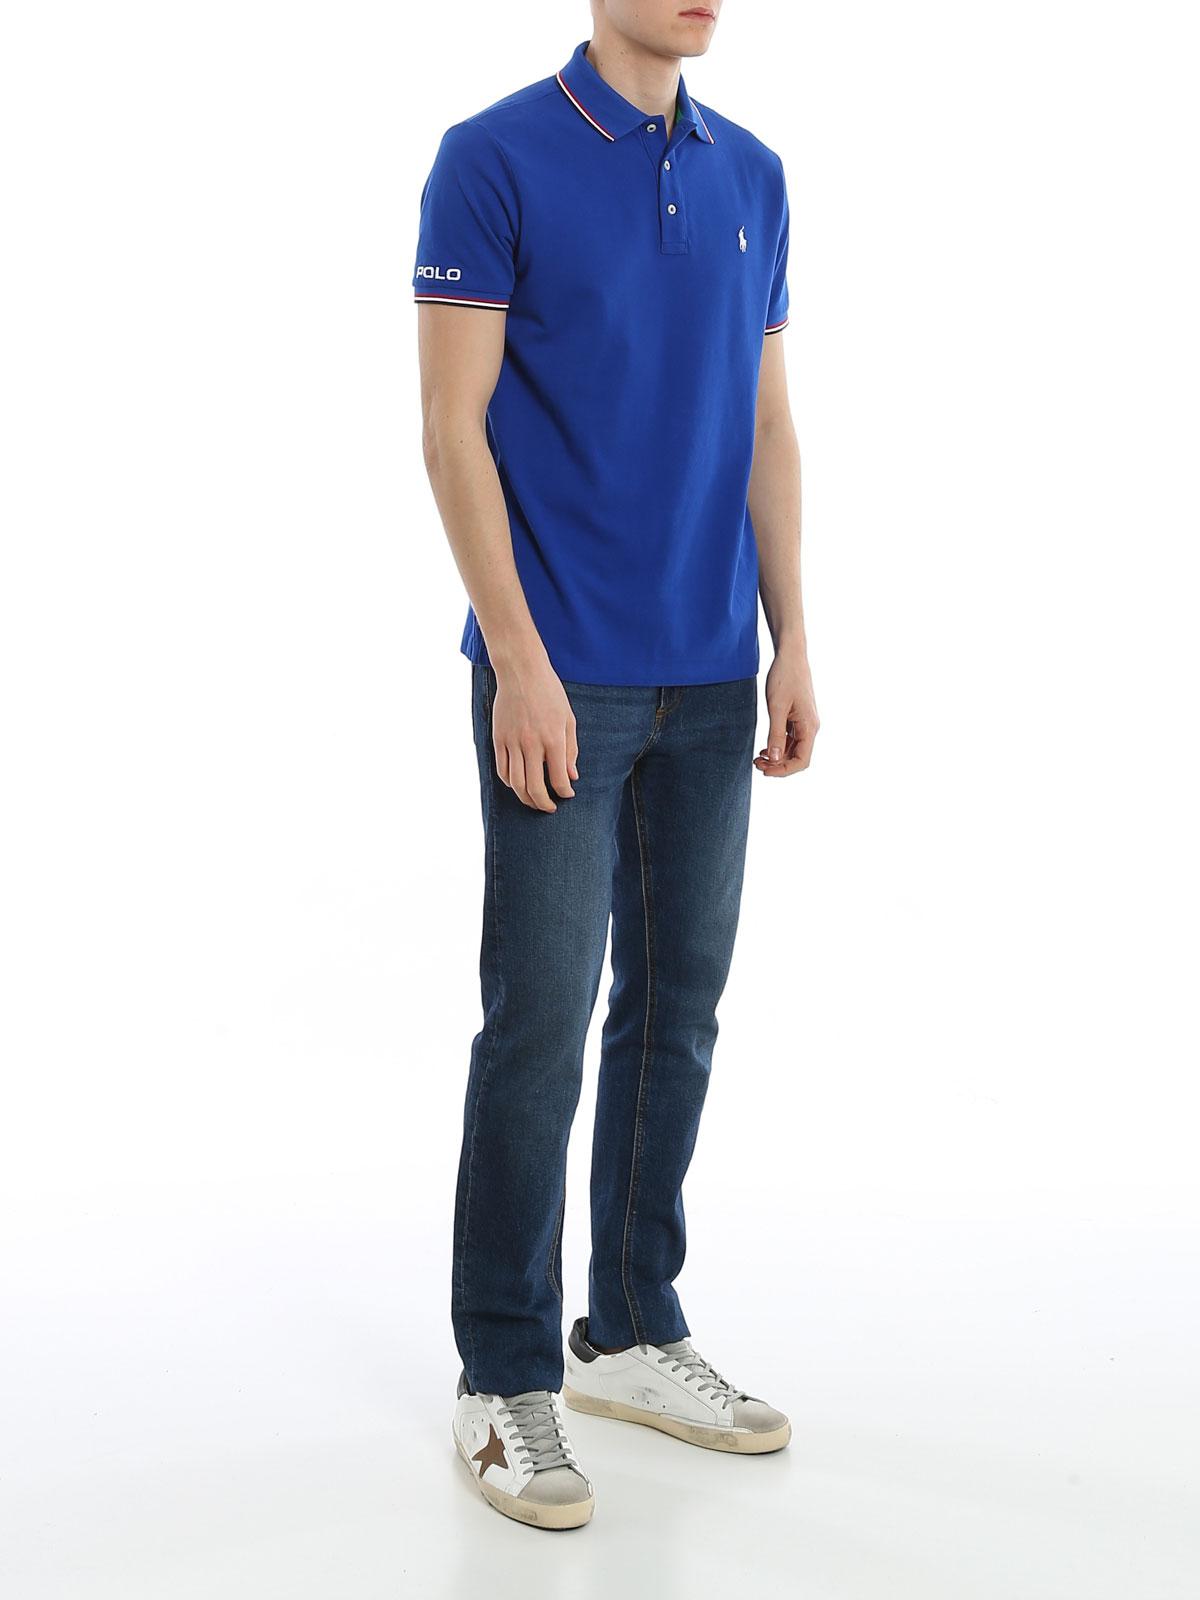 Picture of POLO RALPH LAUREN | Men's Lettering Polo Shirt